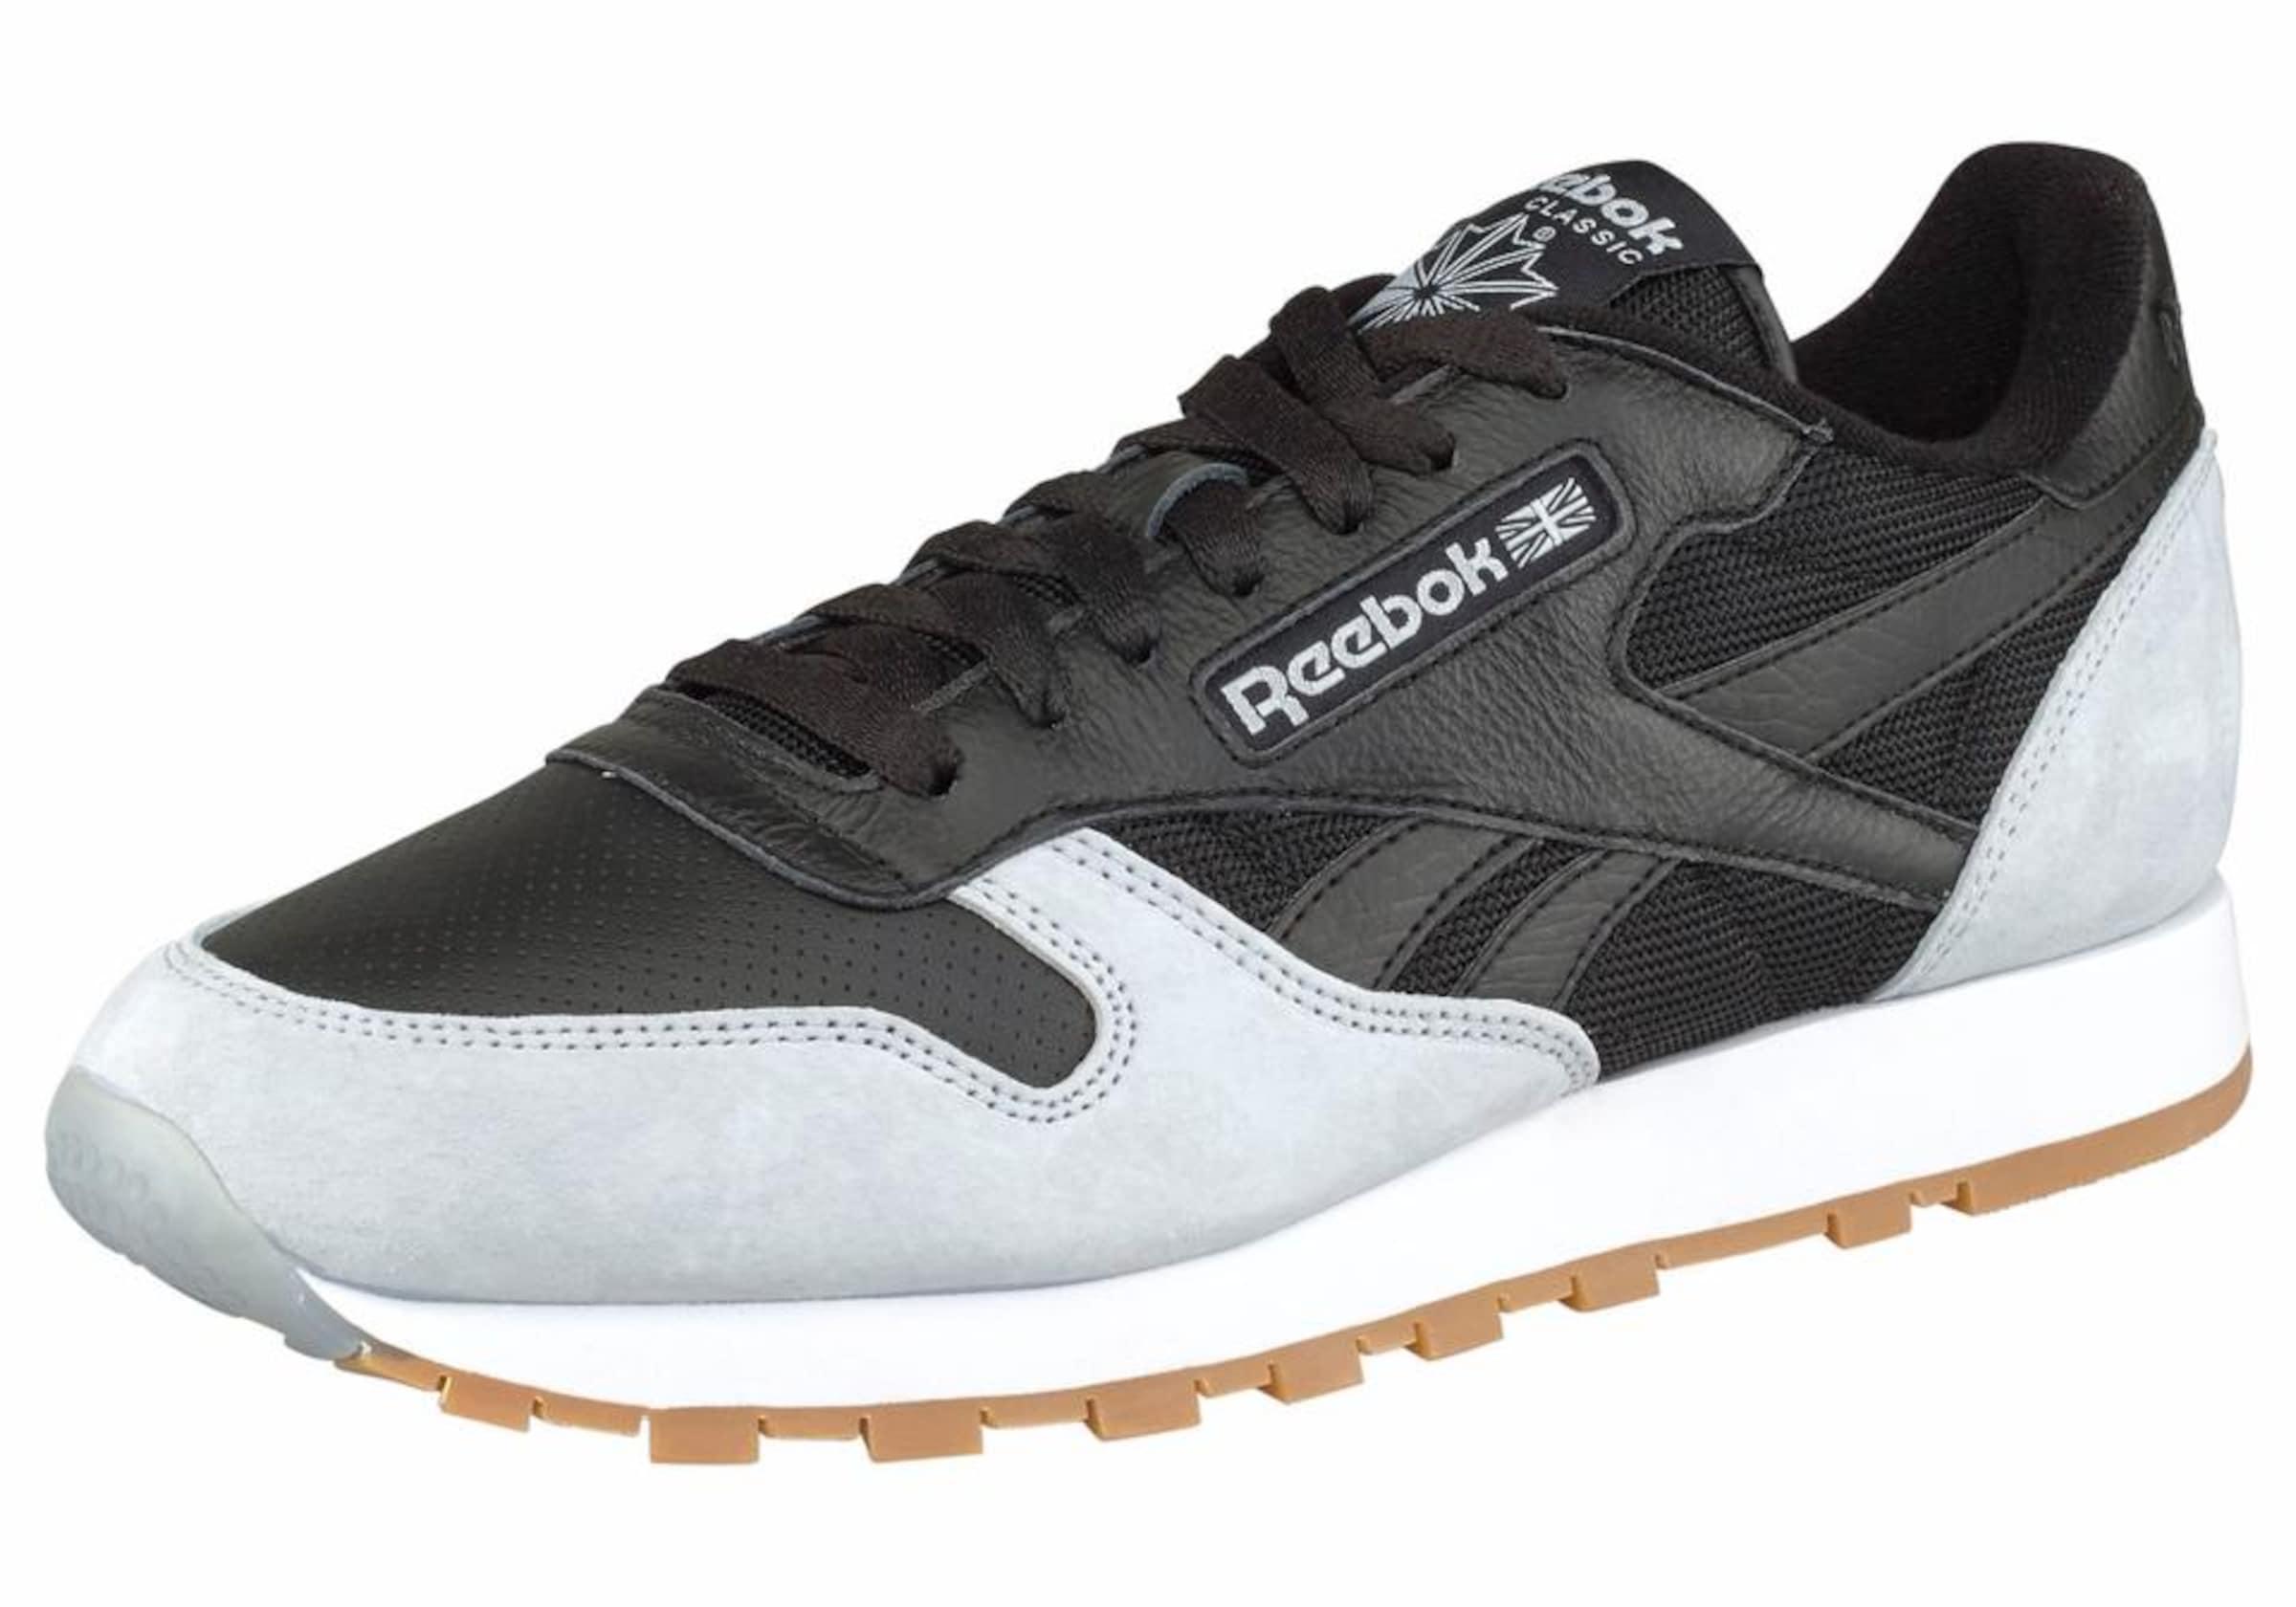 Factory Outlet Günstig Online Reebok classic Sneaker 'Classic Leather SPP' Wahl Verkauf Online-Shop Outlet Große Überraschung Online Zahlen Mit Paypal Verkauf T81xgh